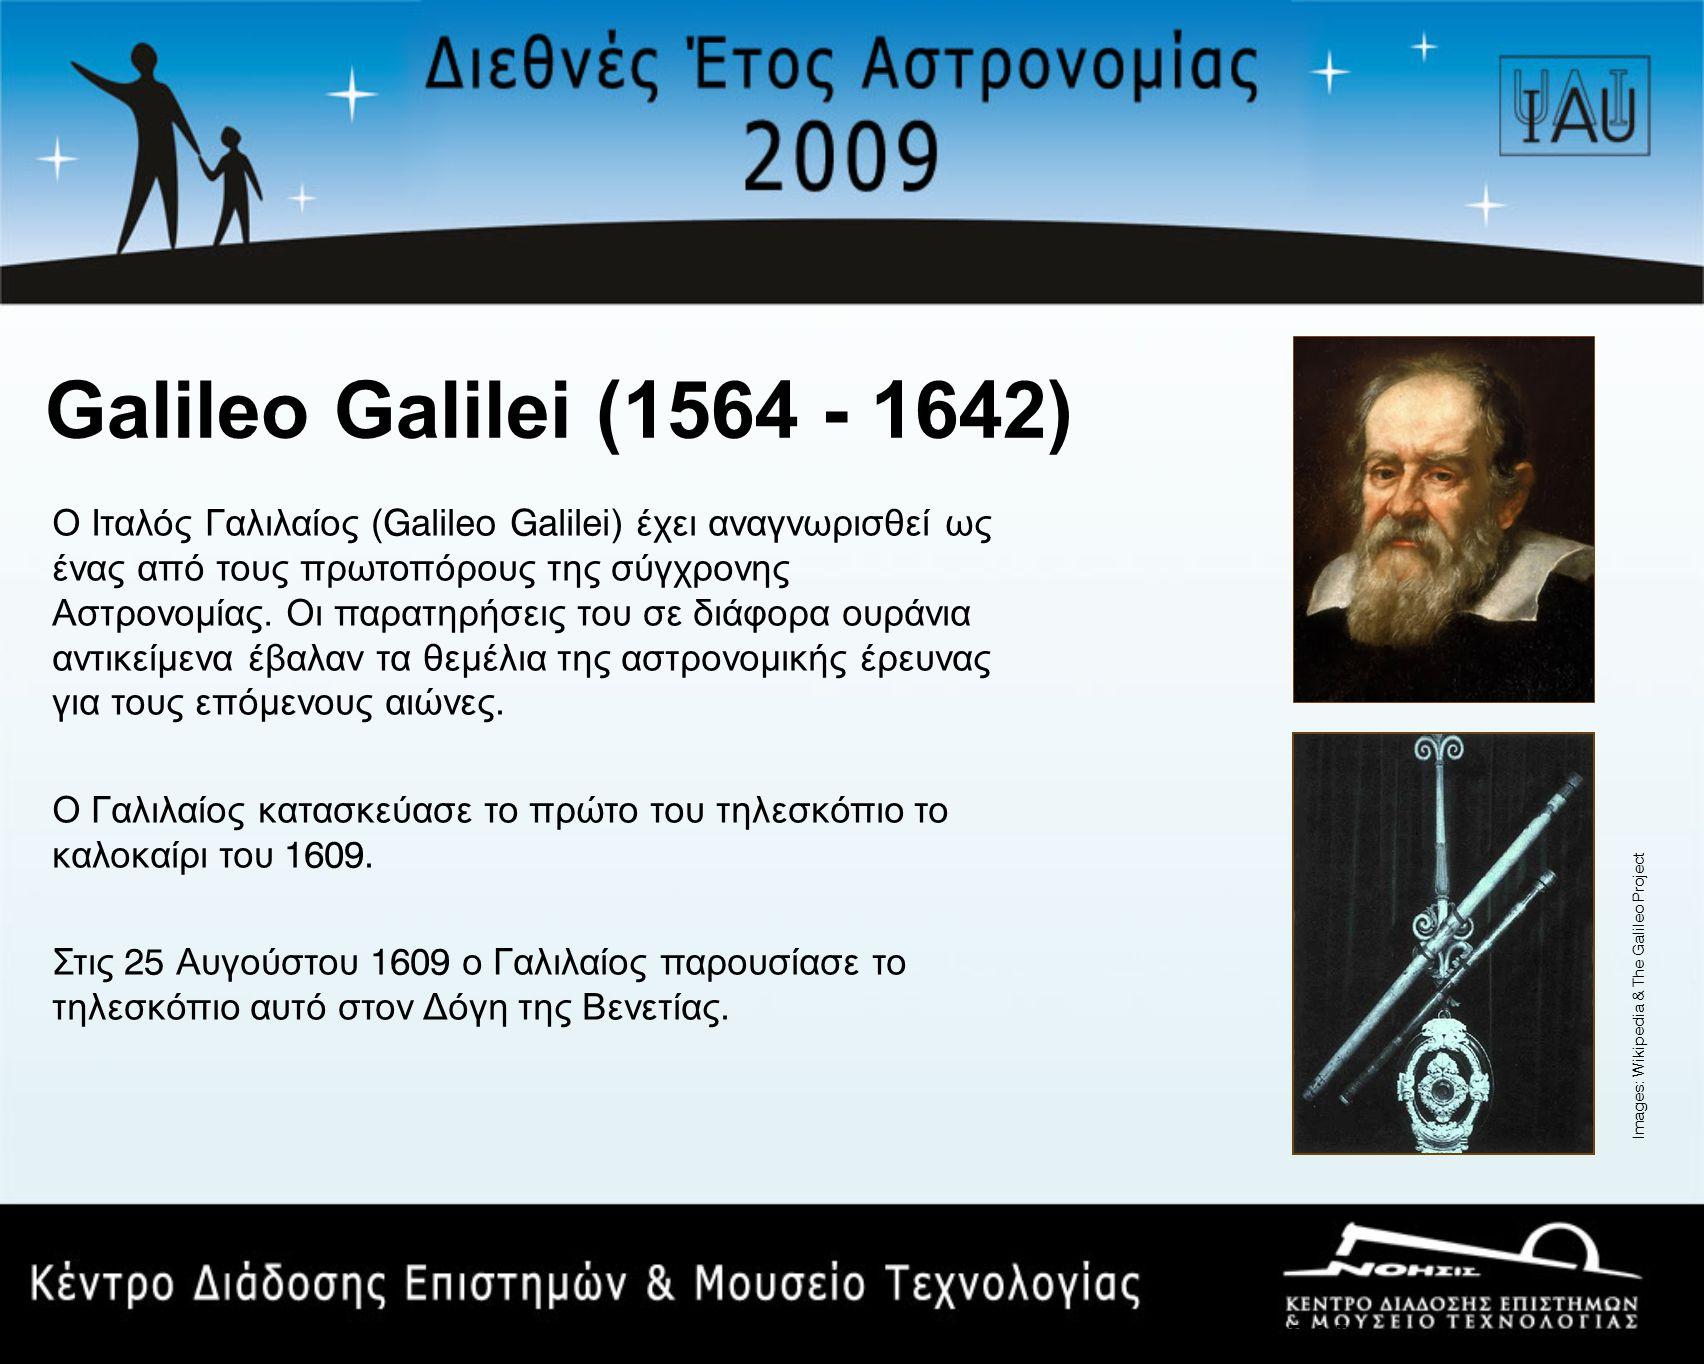 Galileo Galilei (1564 - 1642) Ο Ιταλός Γαλιλαίος ( Galileo Galilei ) έχει αναγνωρισθεί ως ένας από τους πρωτοπόρους της σύγχρονης Αστρονομίας.